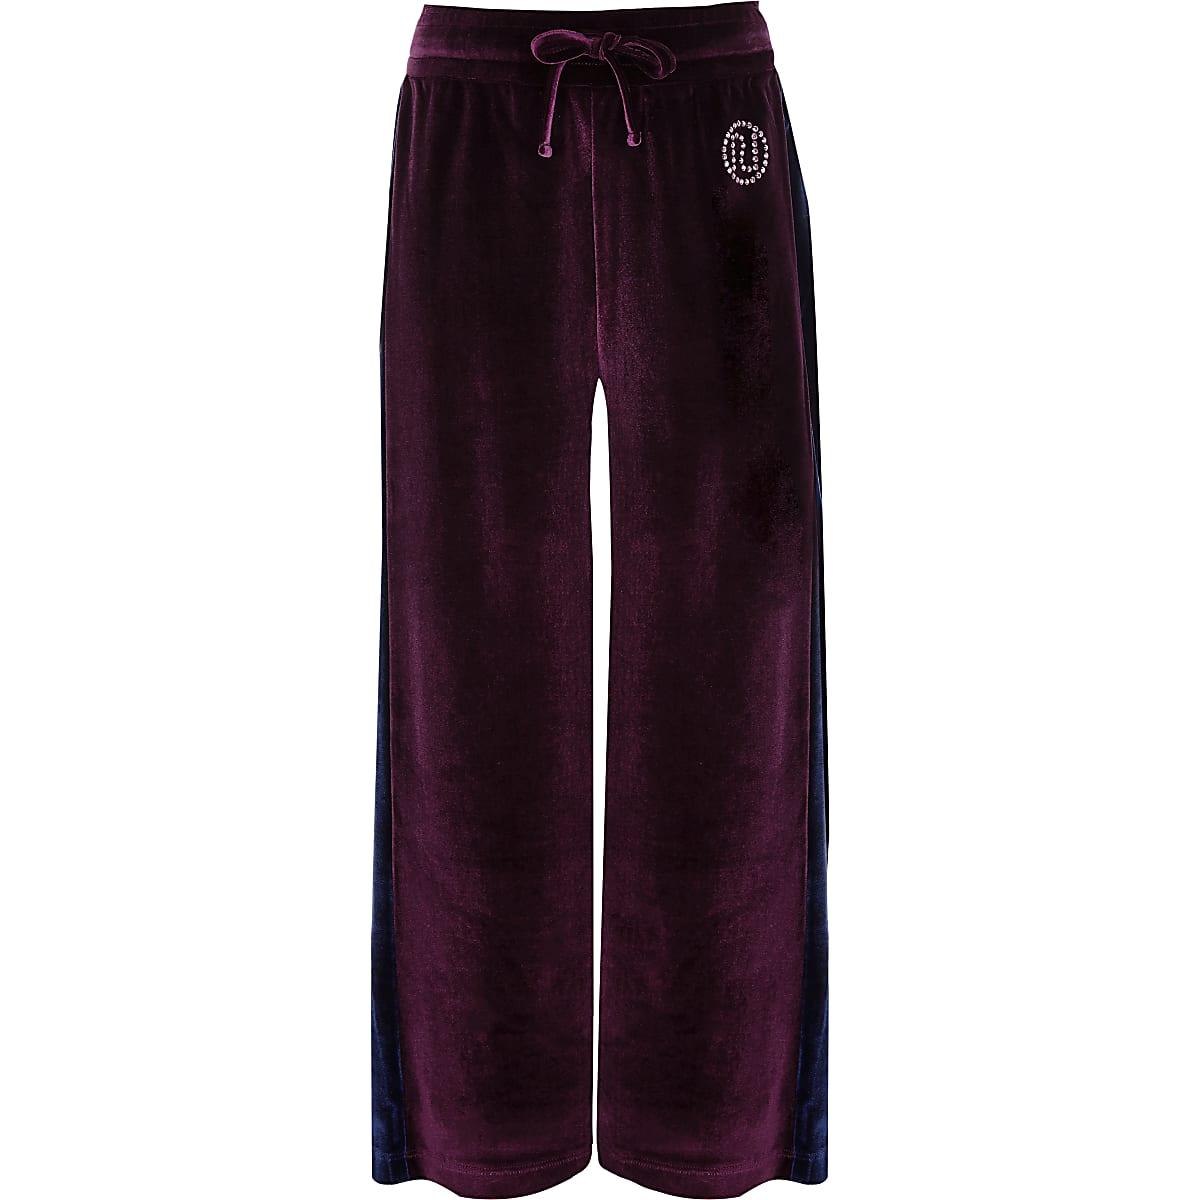 b70f1e5c75d Girls purple velour side stripe trousers - Casual Trousers - Trousers -  girls